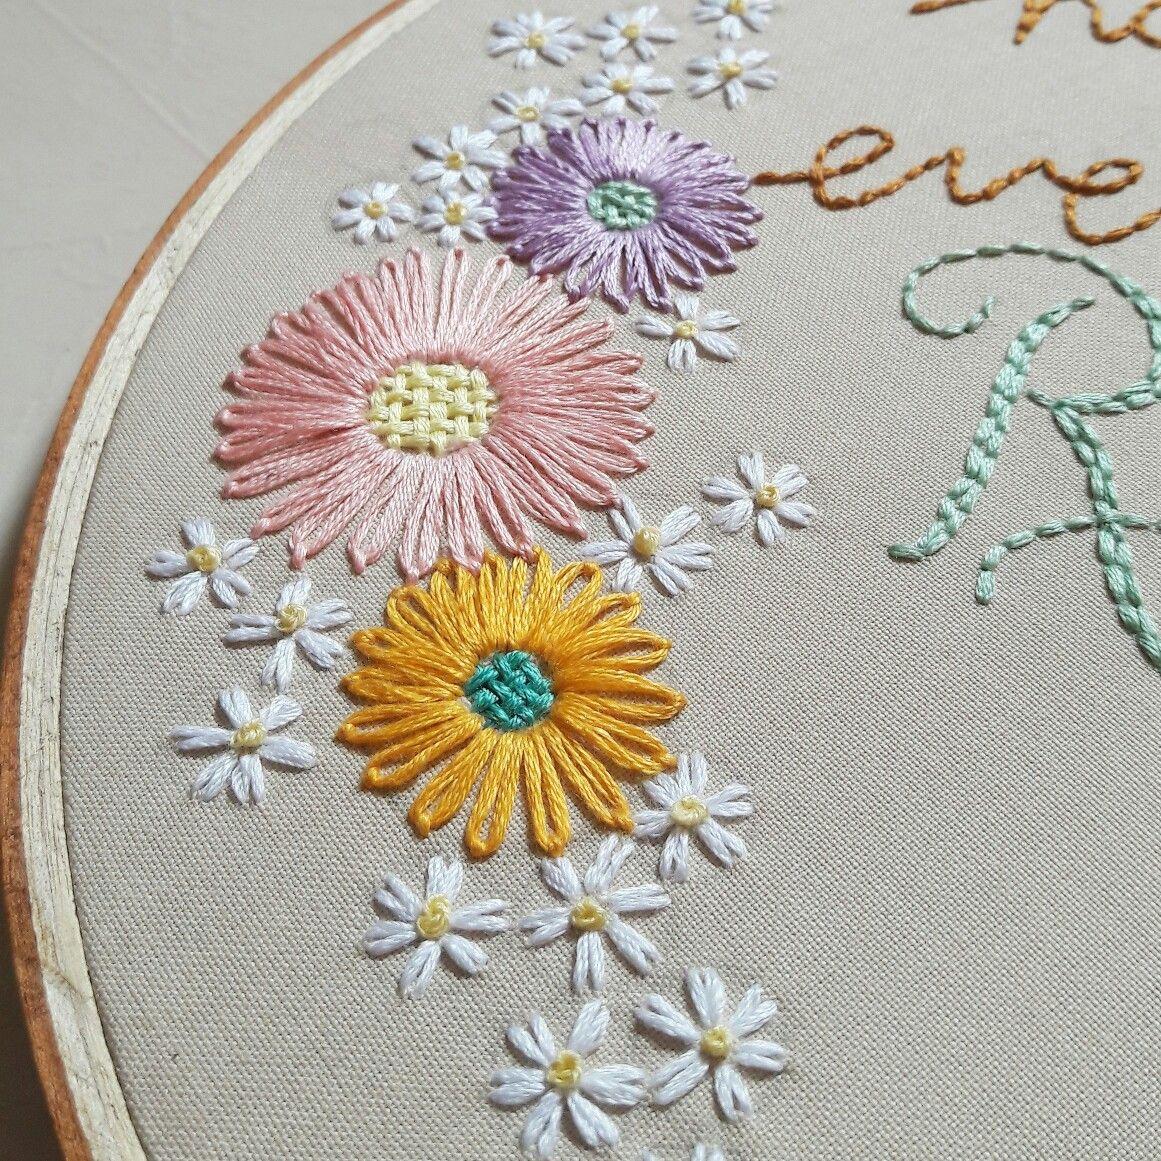 Pin by patricia lópez on bordado cinta pinterest embroidery